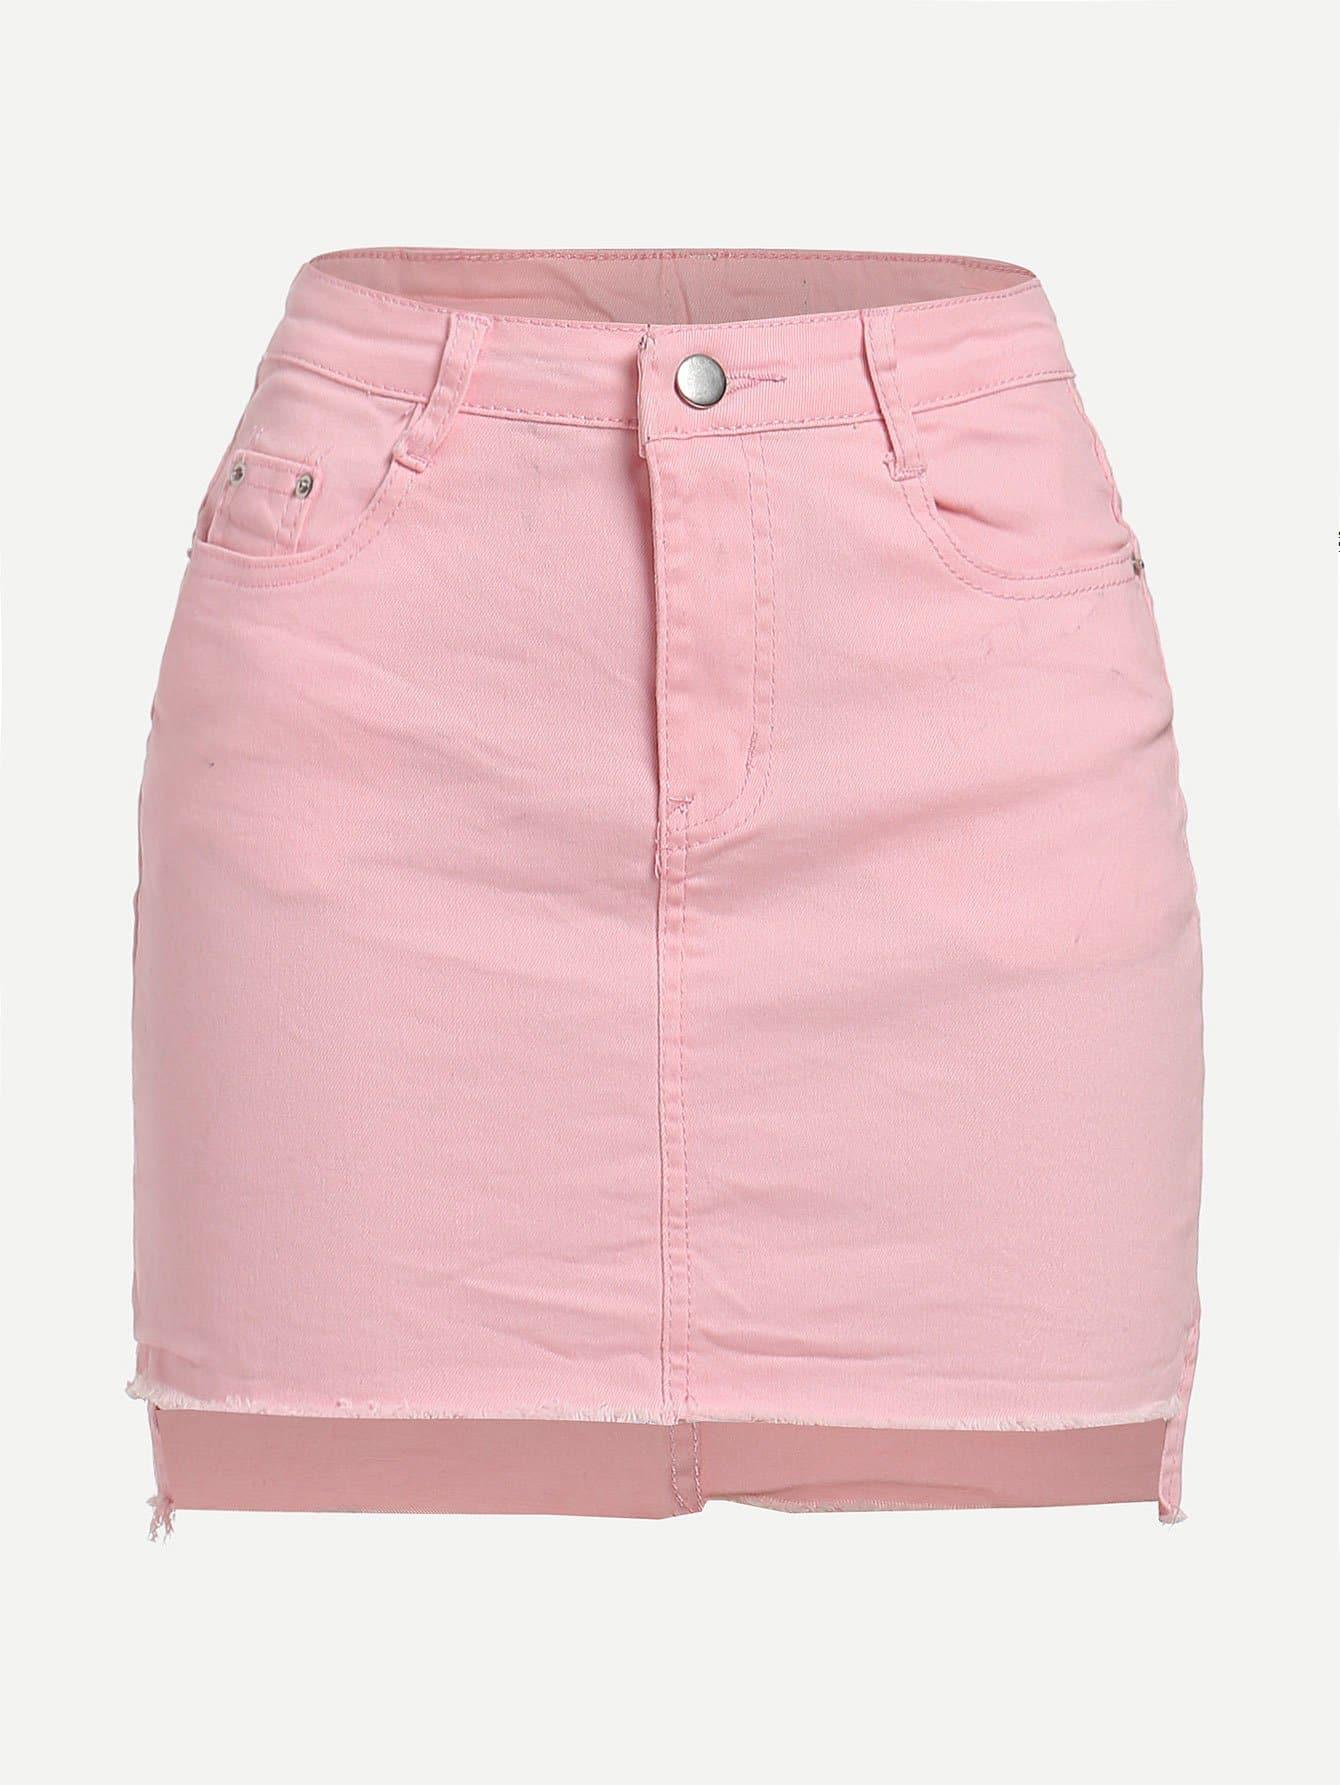 Raw Hem Asymmetrical Denim Skirt